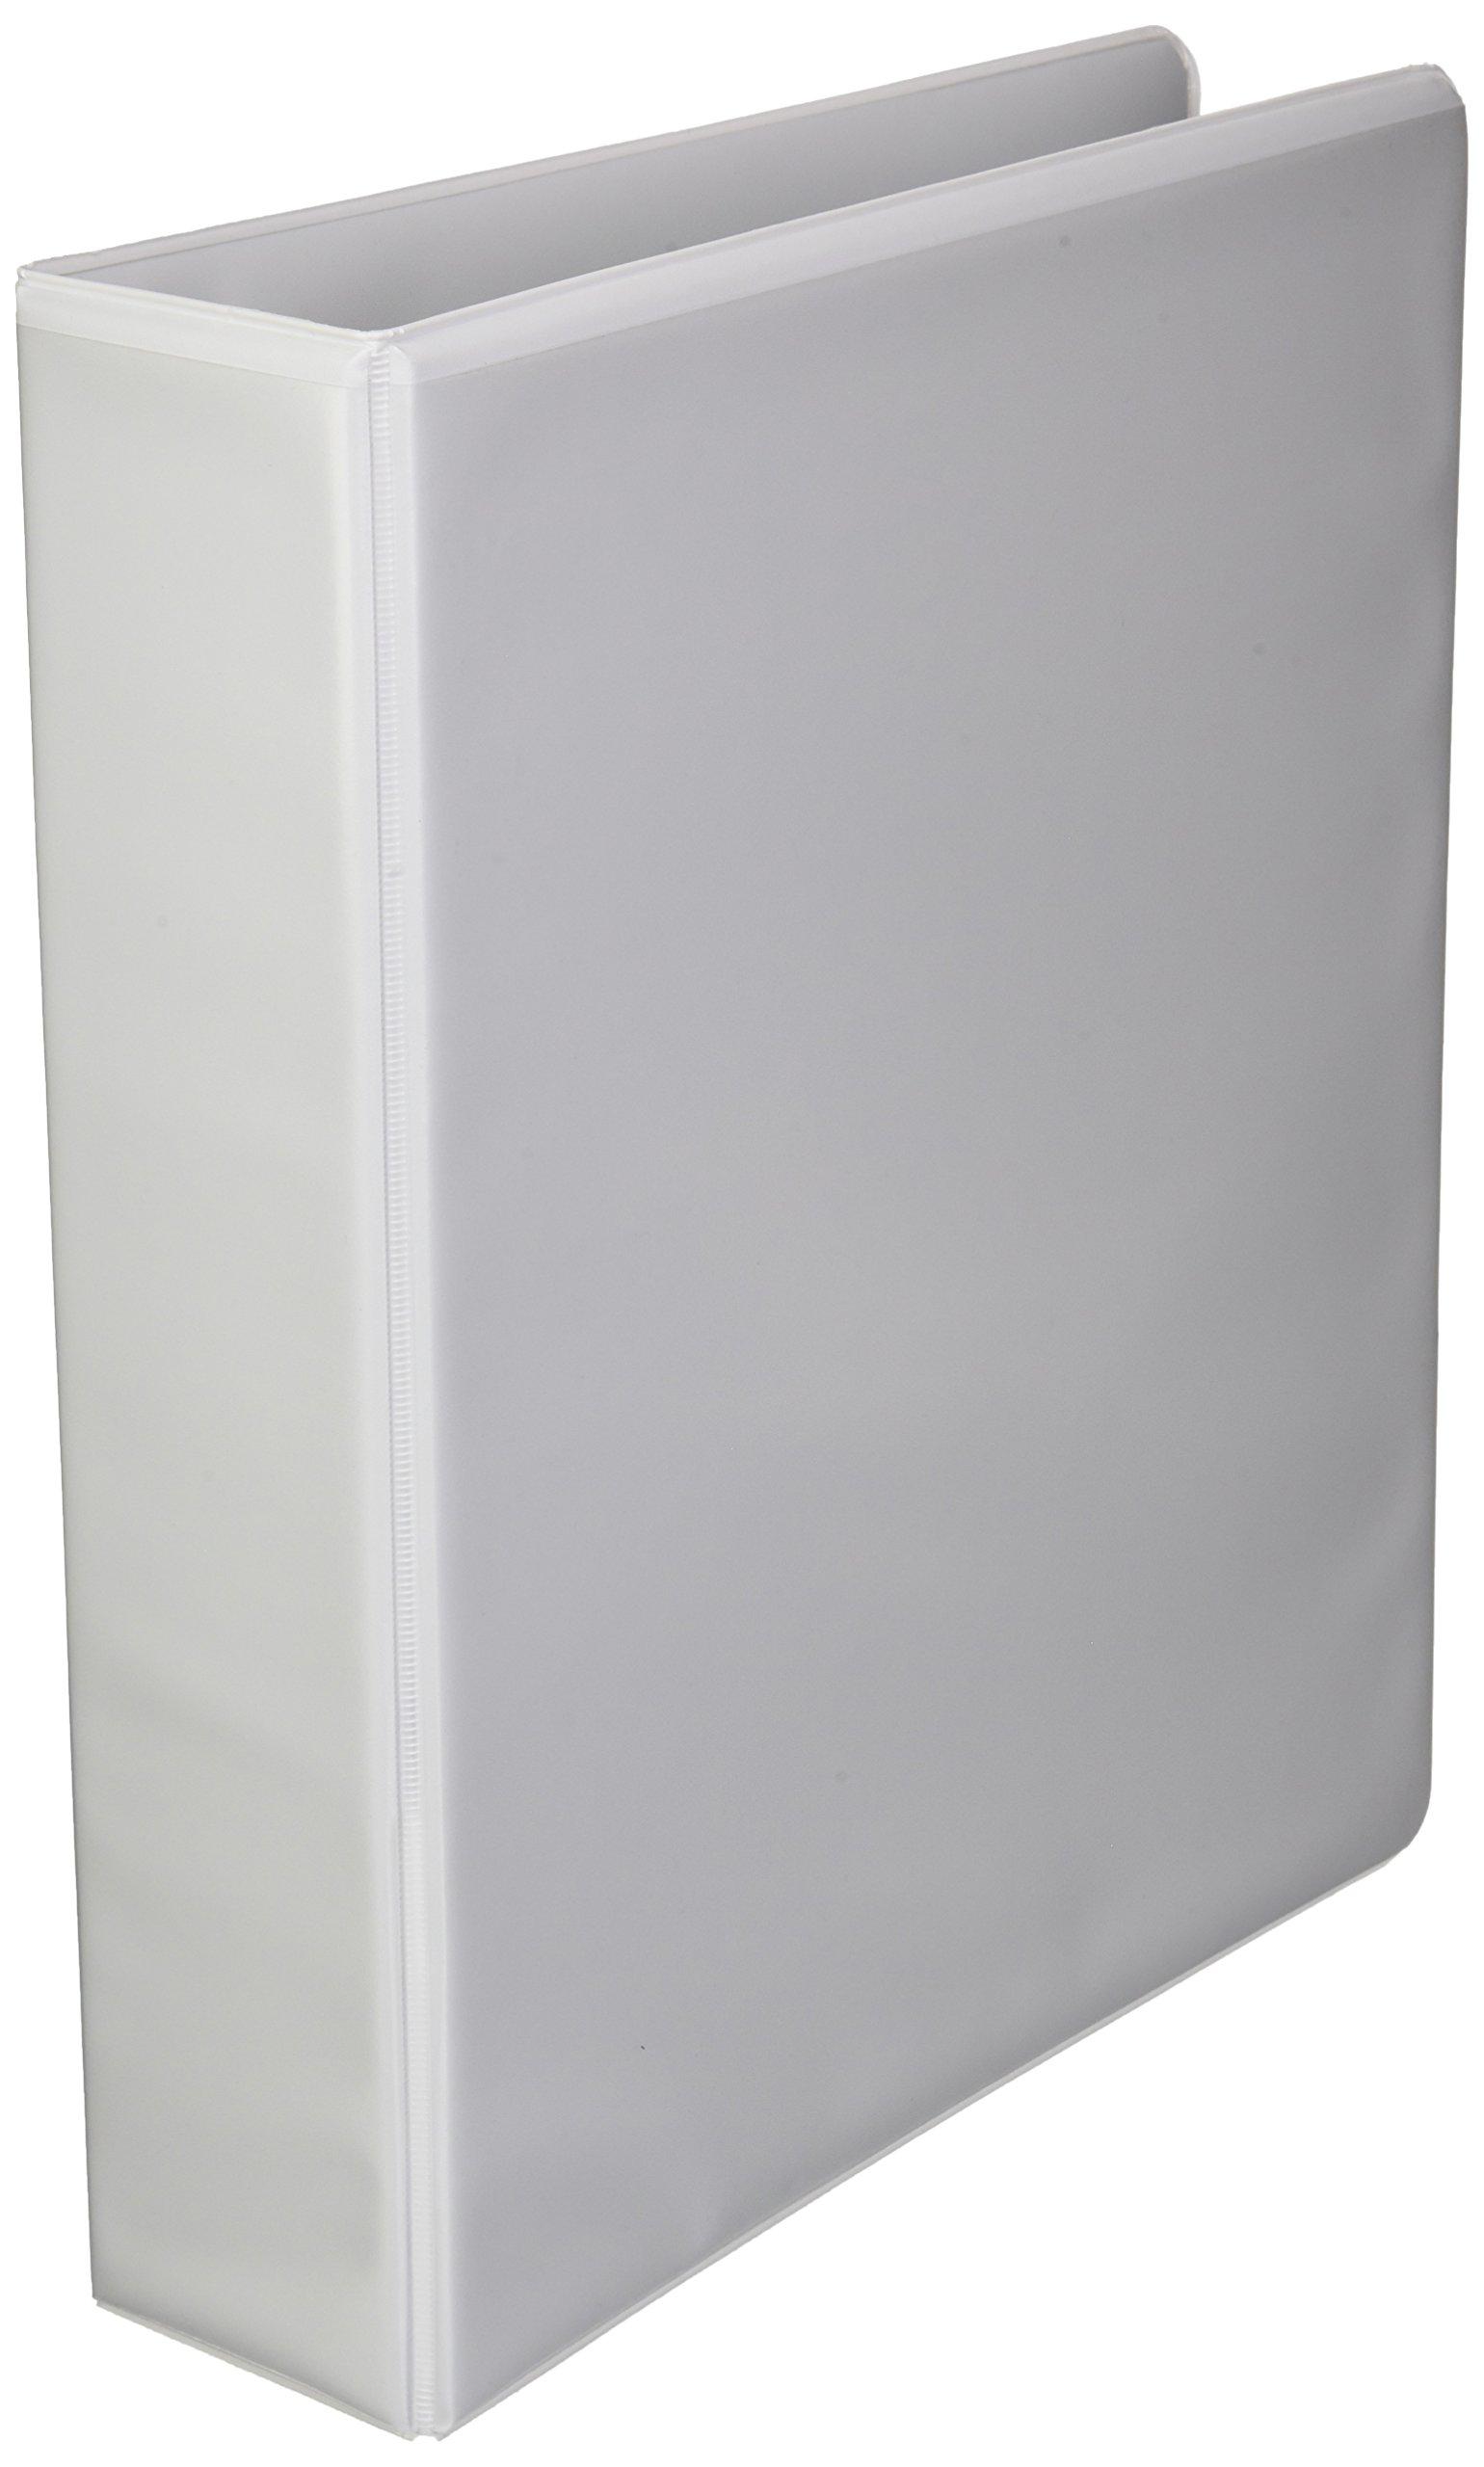 Wilson Jones International A4 4-Ring View Binder, 2 Inch, Customizable, White (W40823)